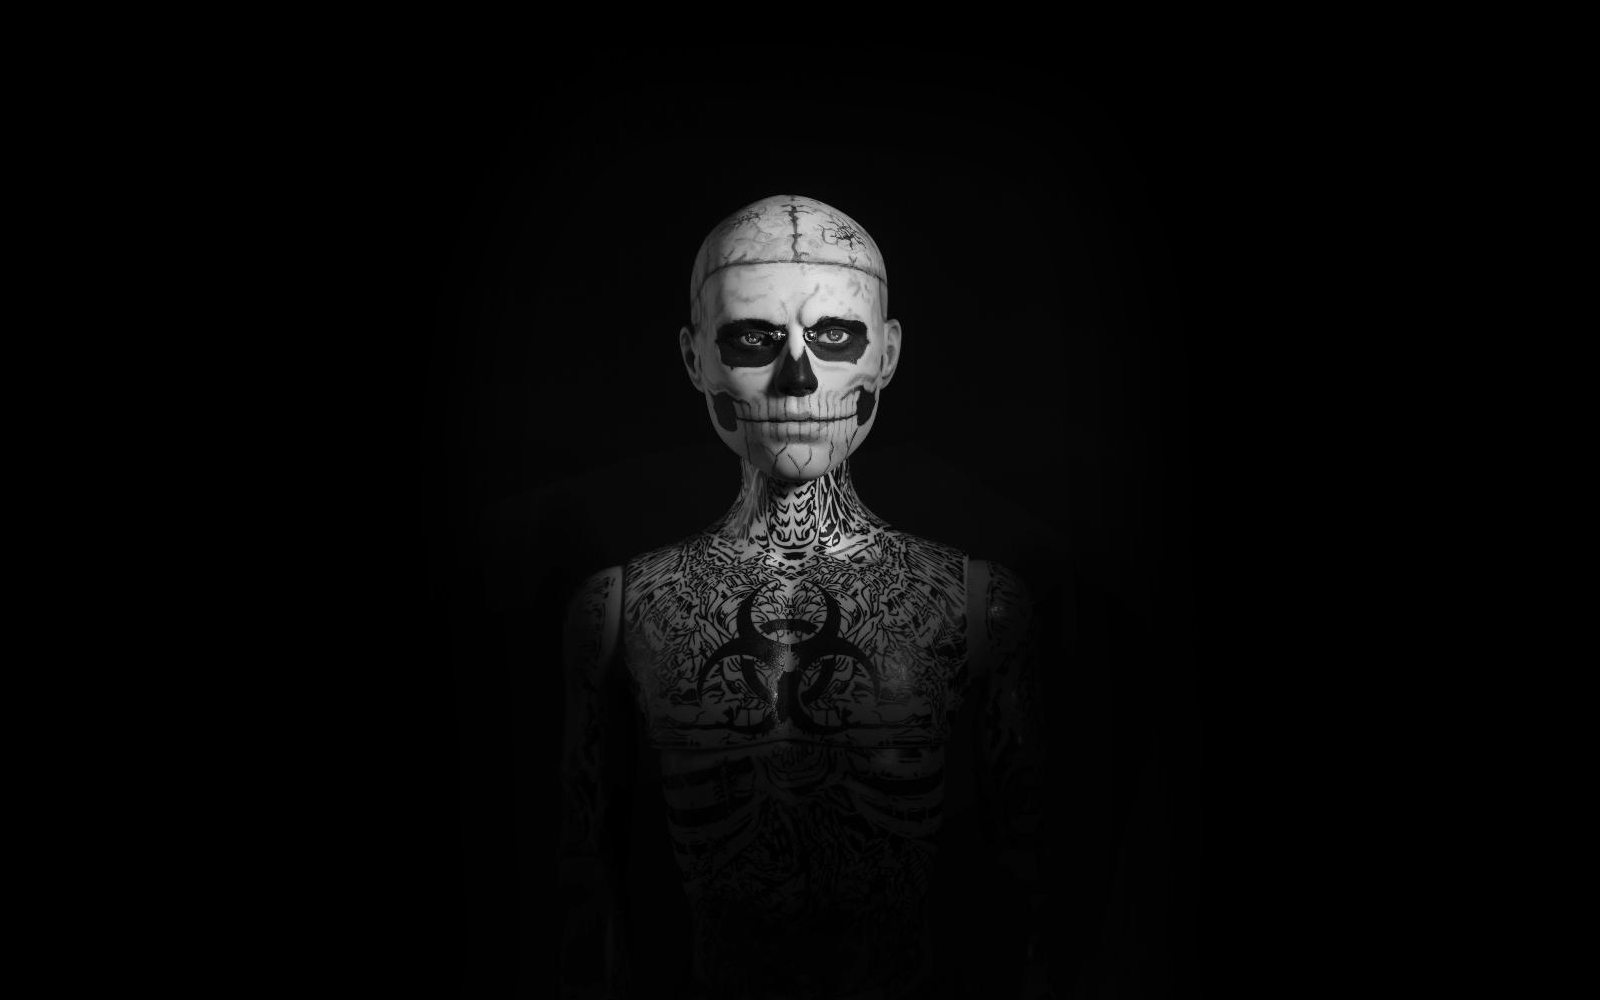 Zombie Backgorund Images - Zombie Backgorund Images